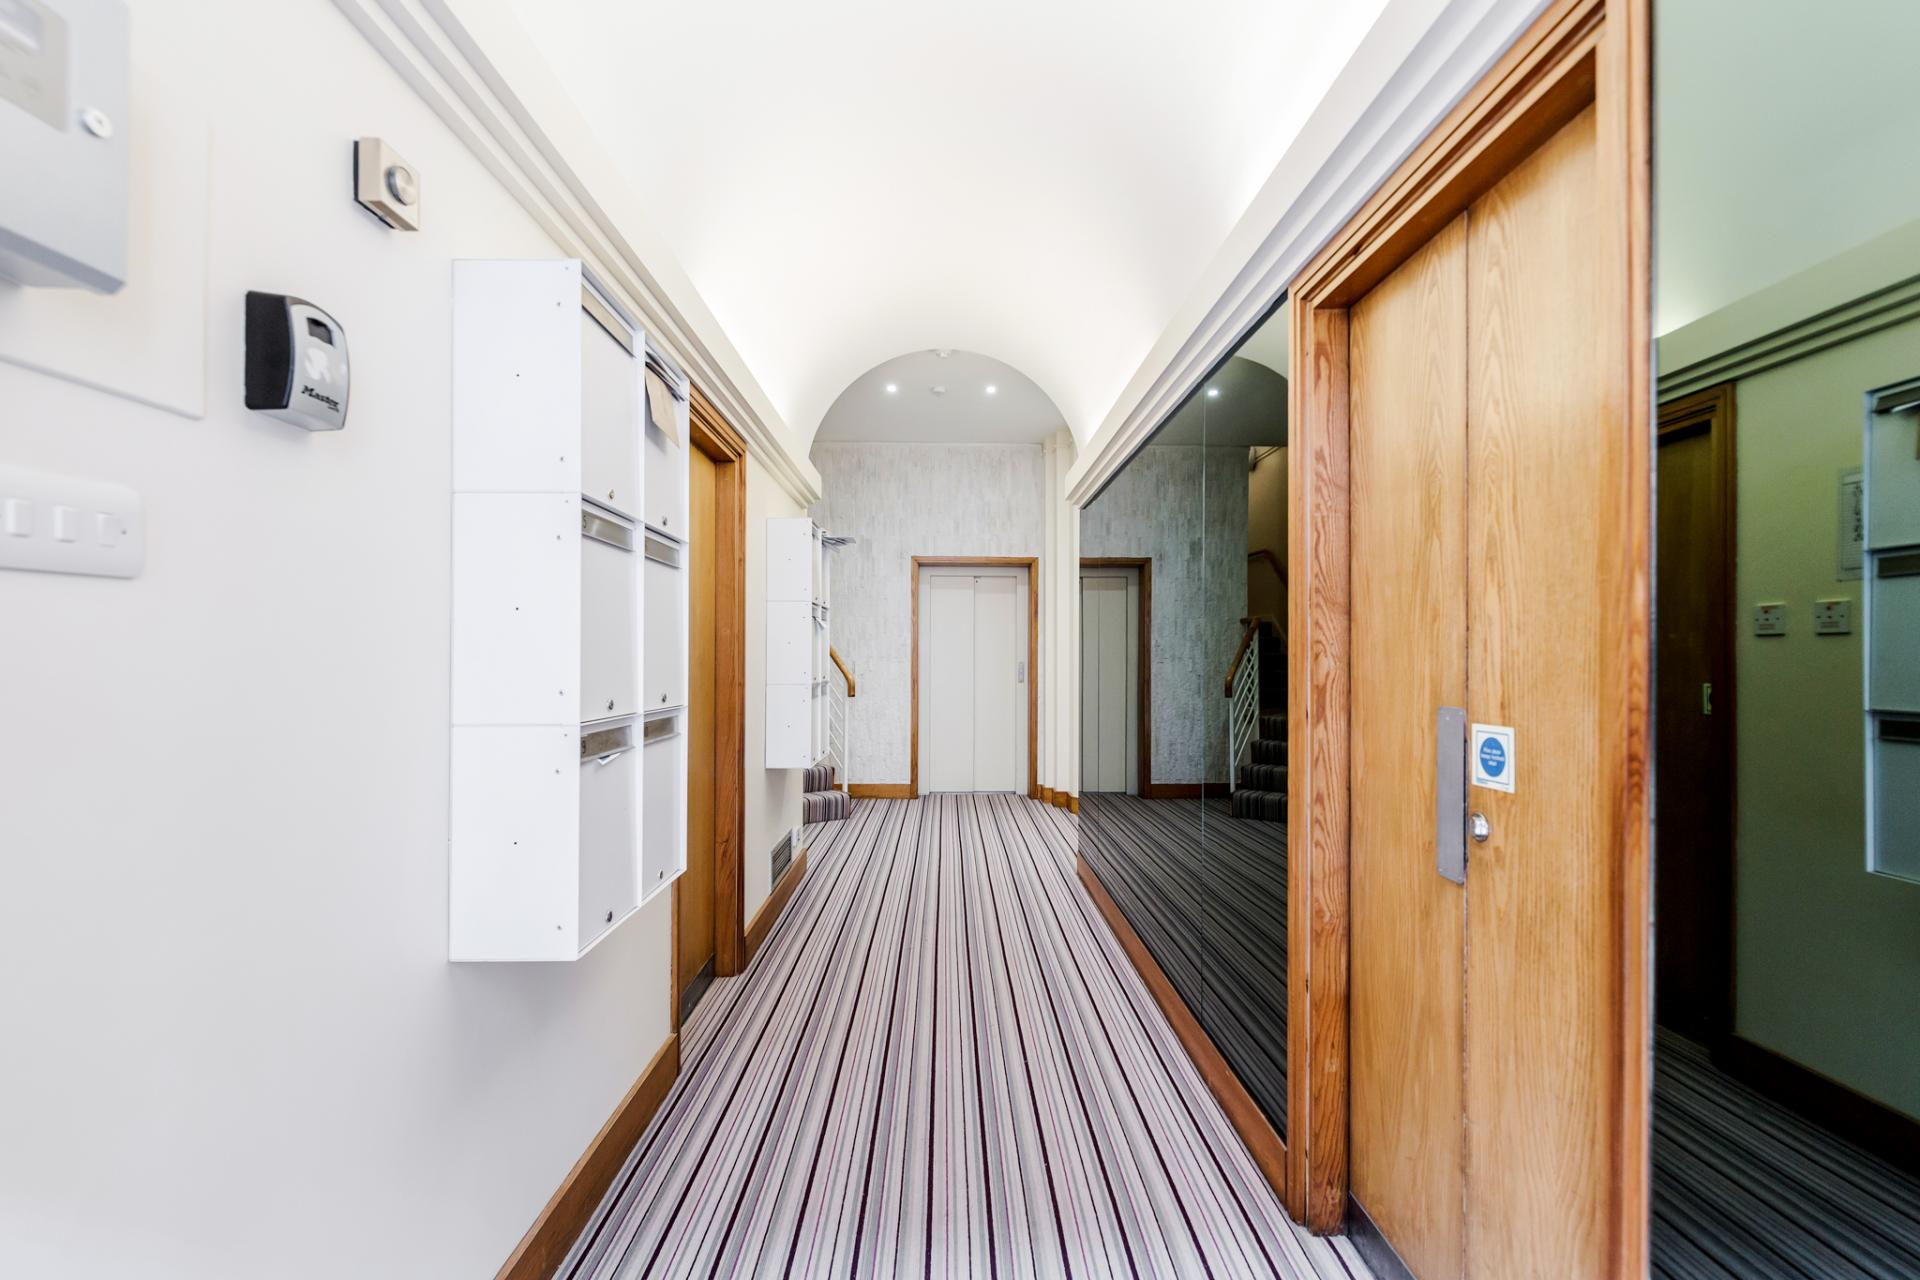 Hallway at Earls Court Serviced Apartment, Kensington, London - Citybase Apartments